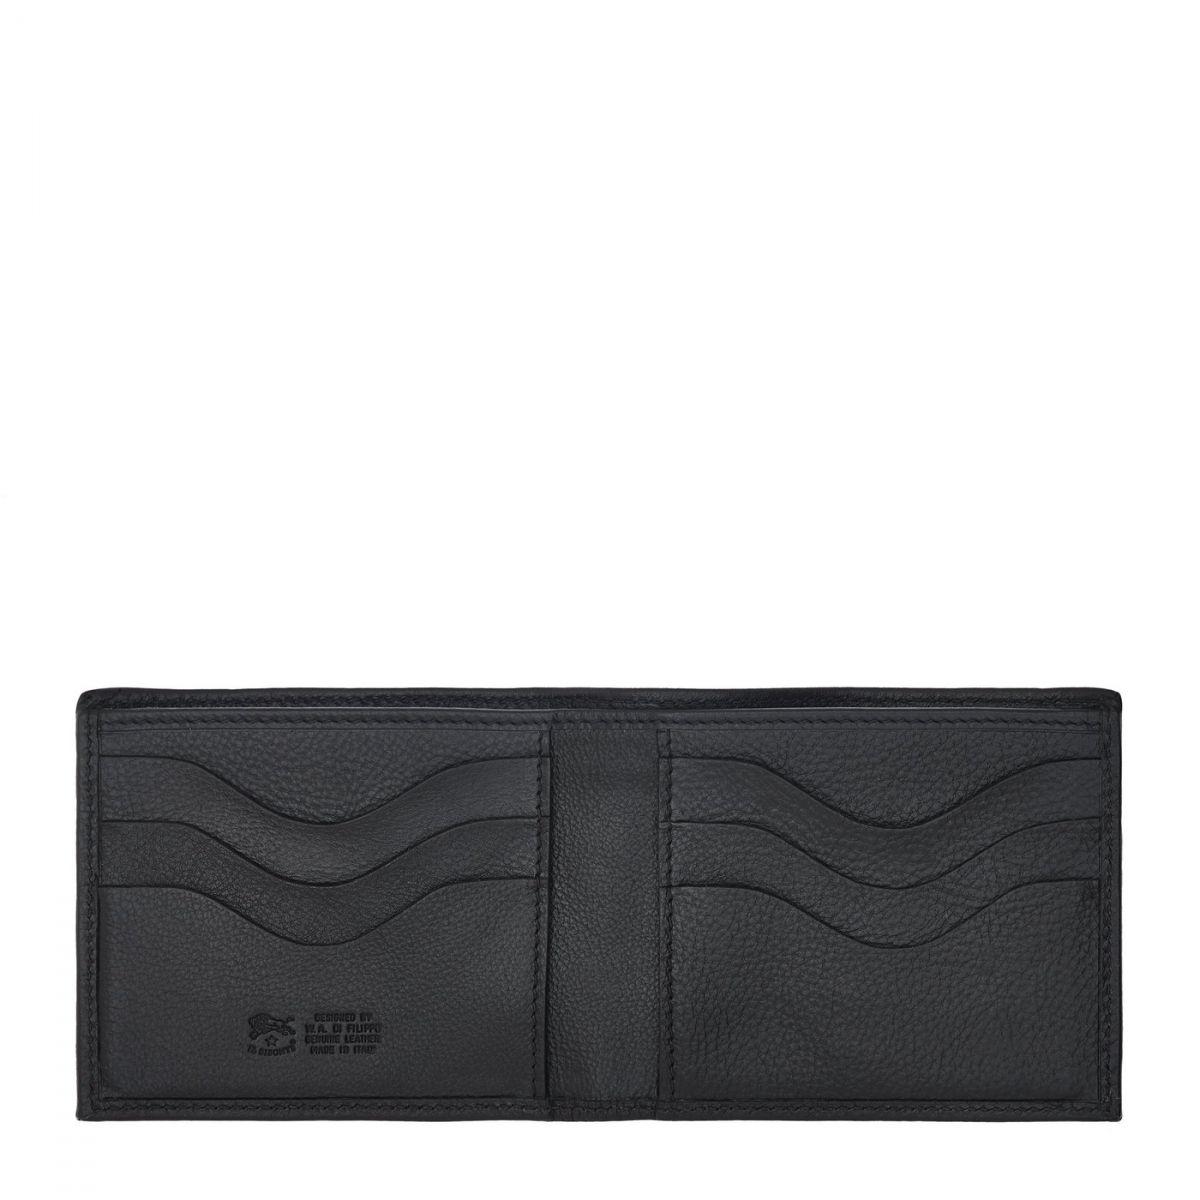 Men's Bi-Fold Wallet  in Cowhide Double Leather SBW029 color Black | Details